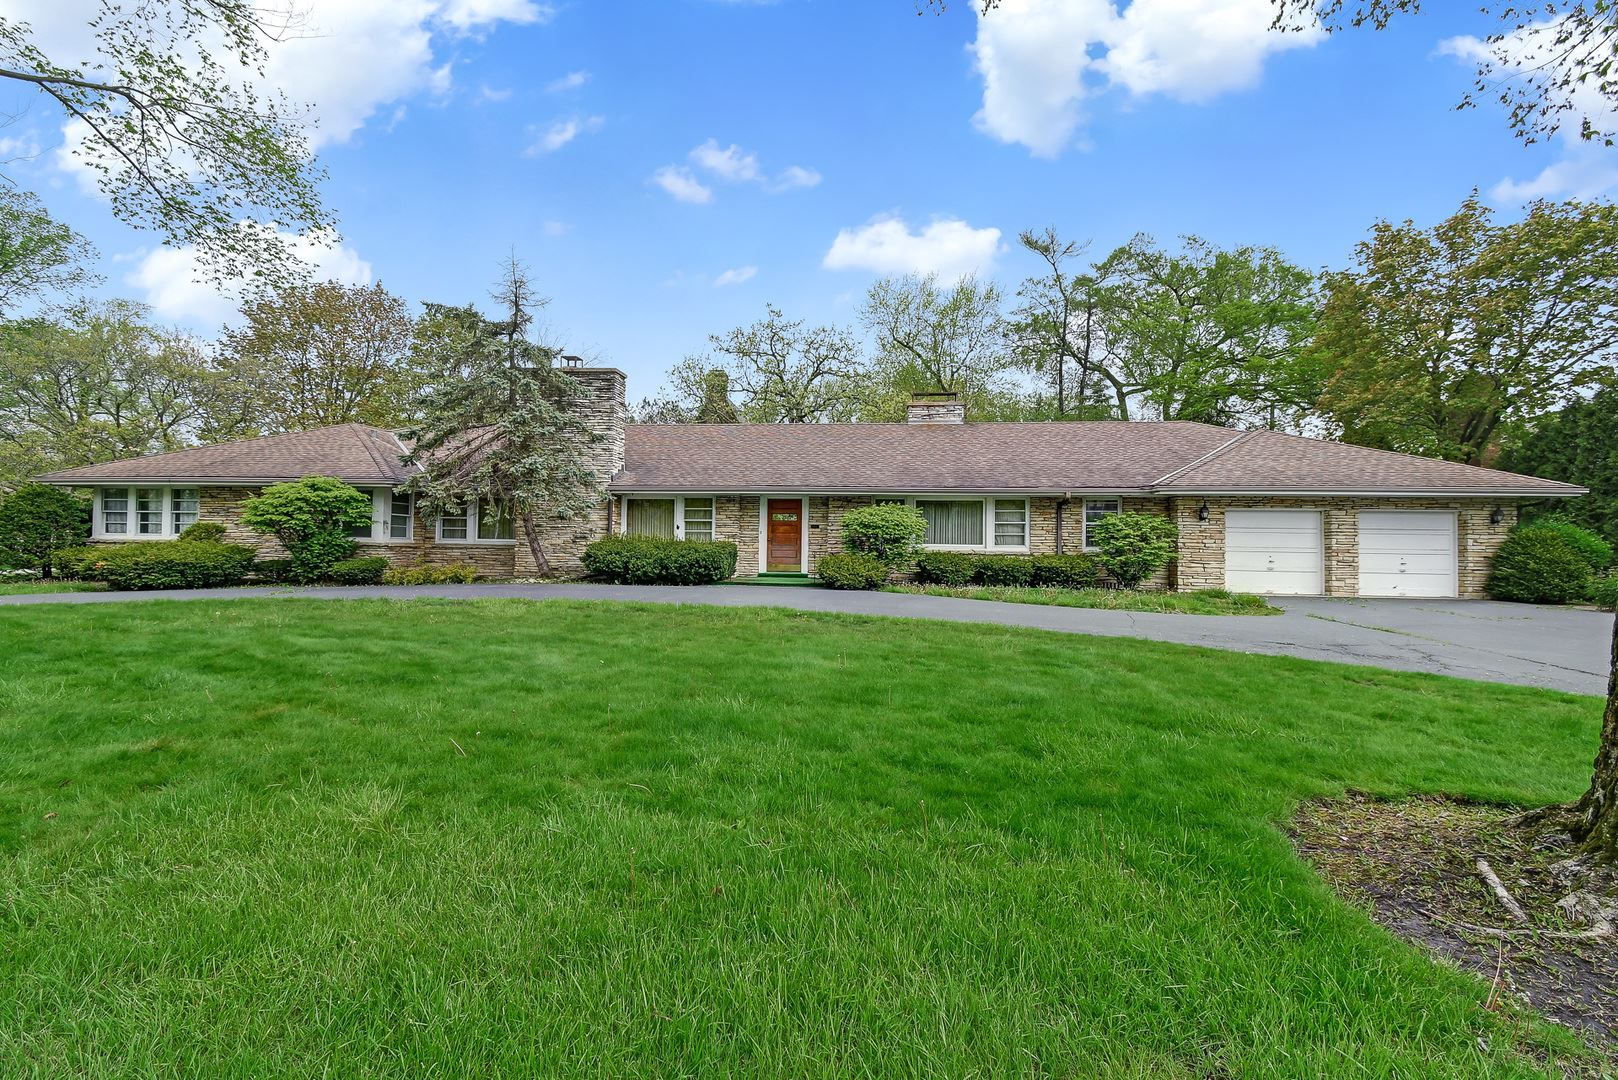 555 Woodland Avenue, Hinsdale, IL 60521 - #: 10615449